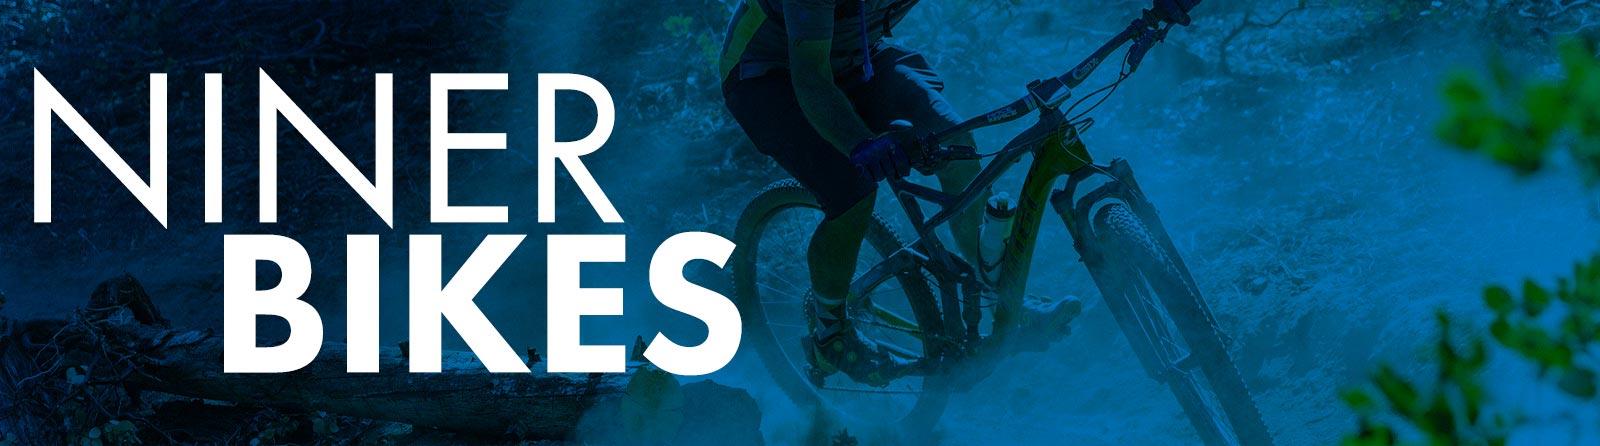 Niner Mountain and Gravel Bikes